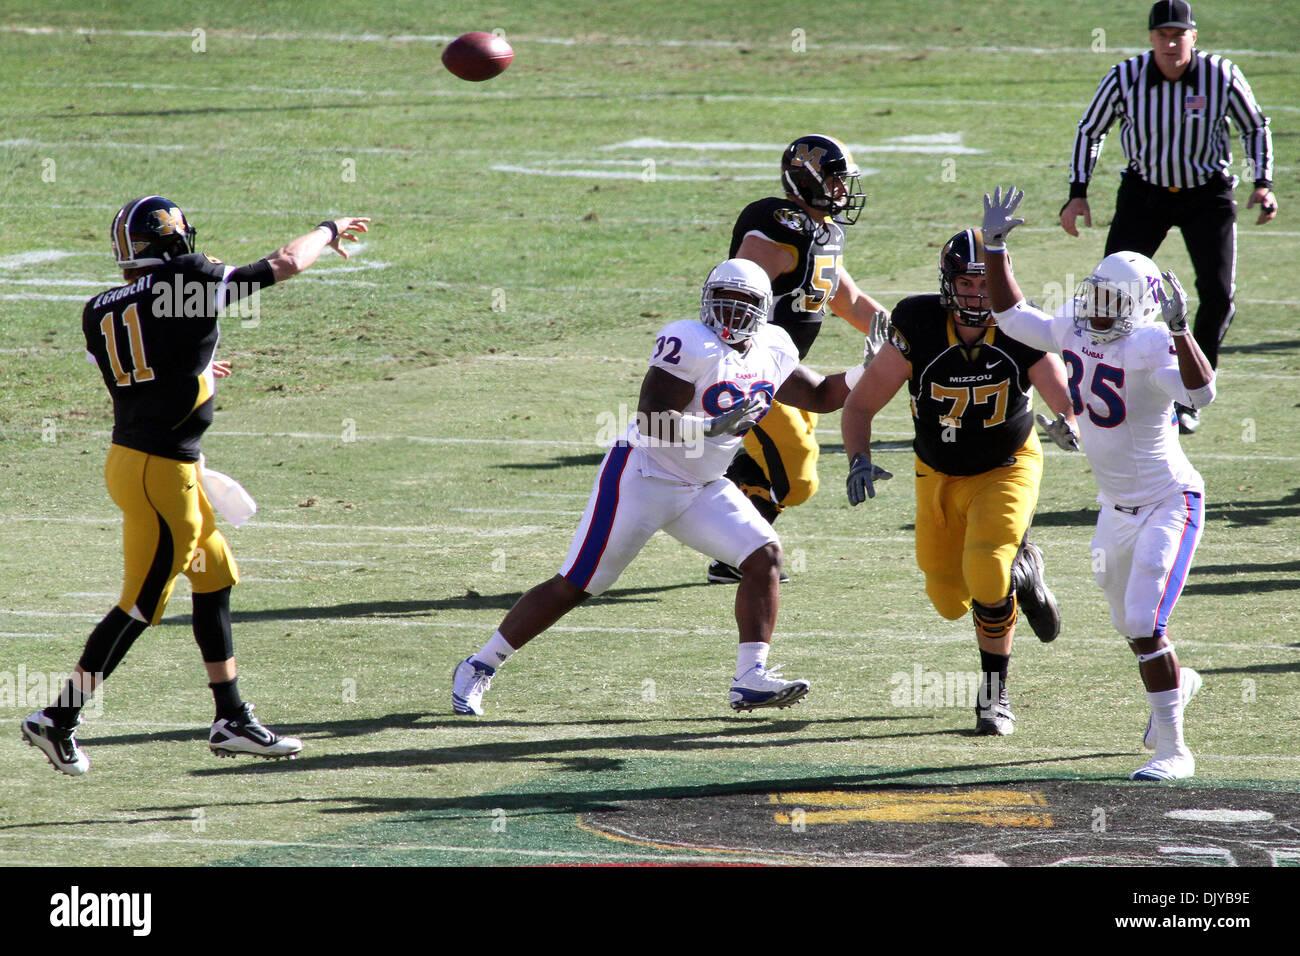 Alabama-Quarterback datiert